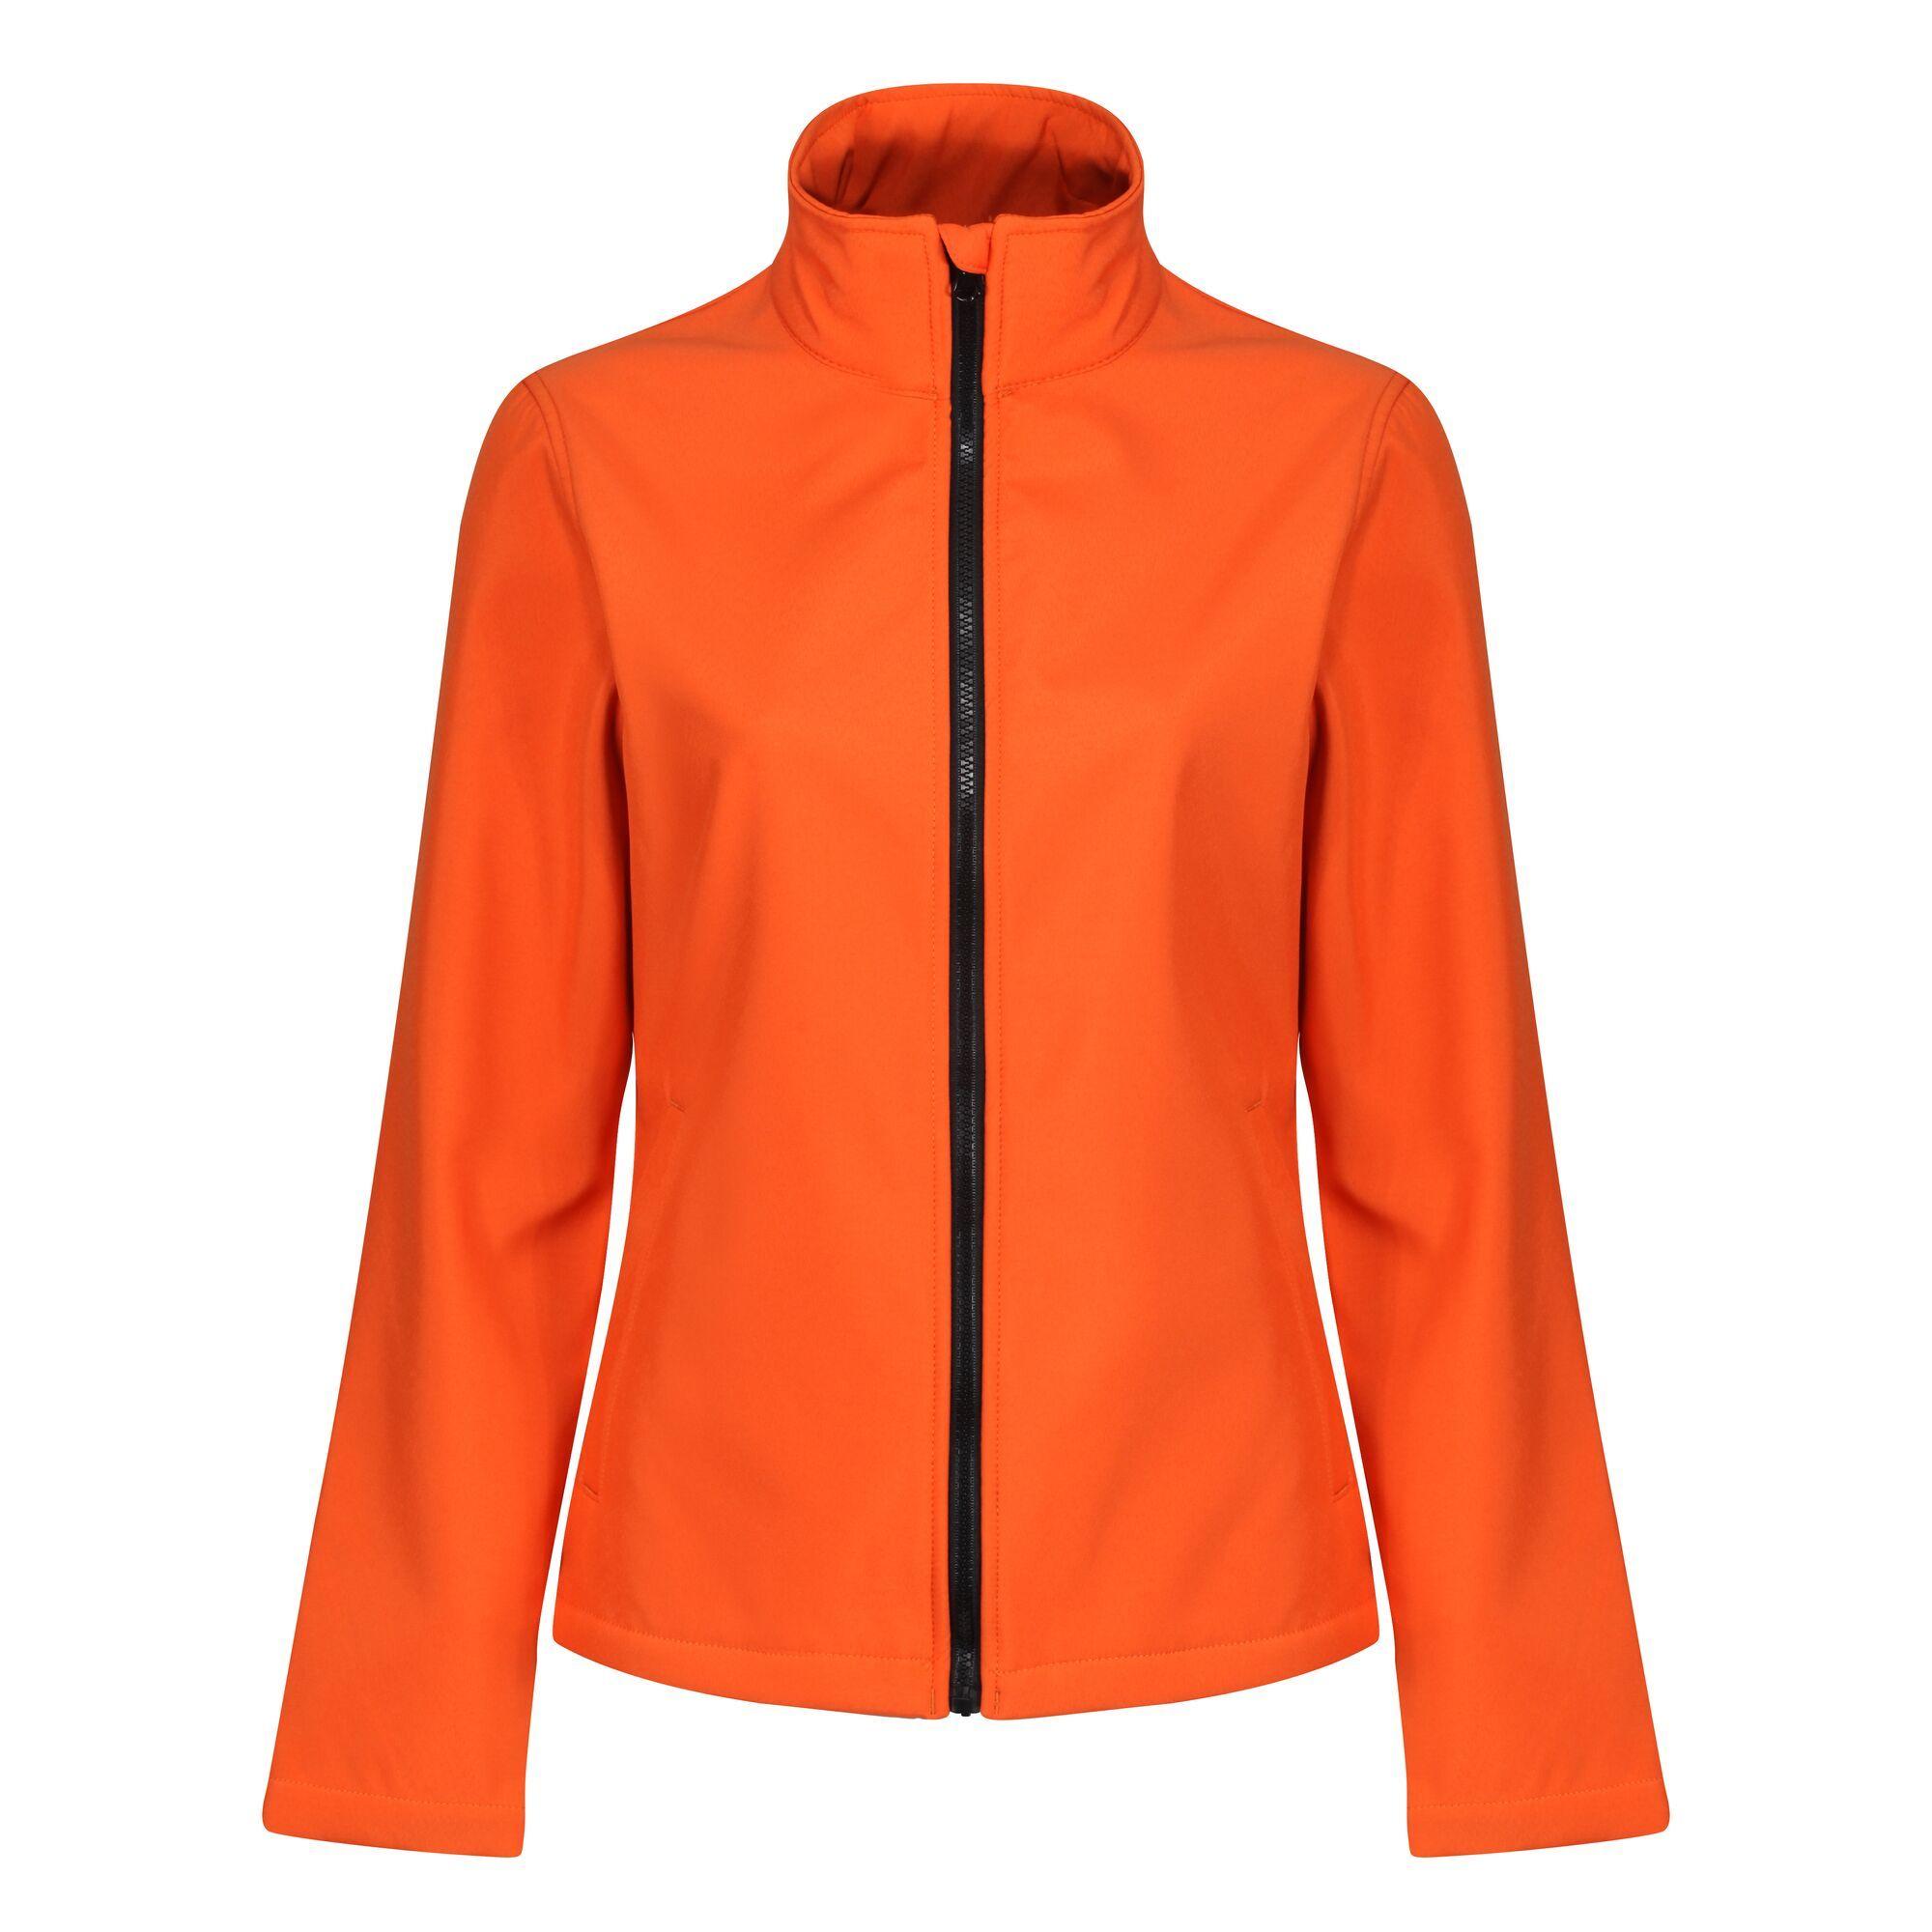 Regatta Standout Womens/Ladies Ablaze Printable Soft Shell Jacket (16) (Black/Classic Red)